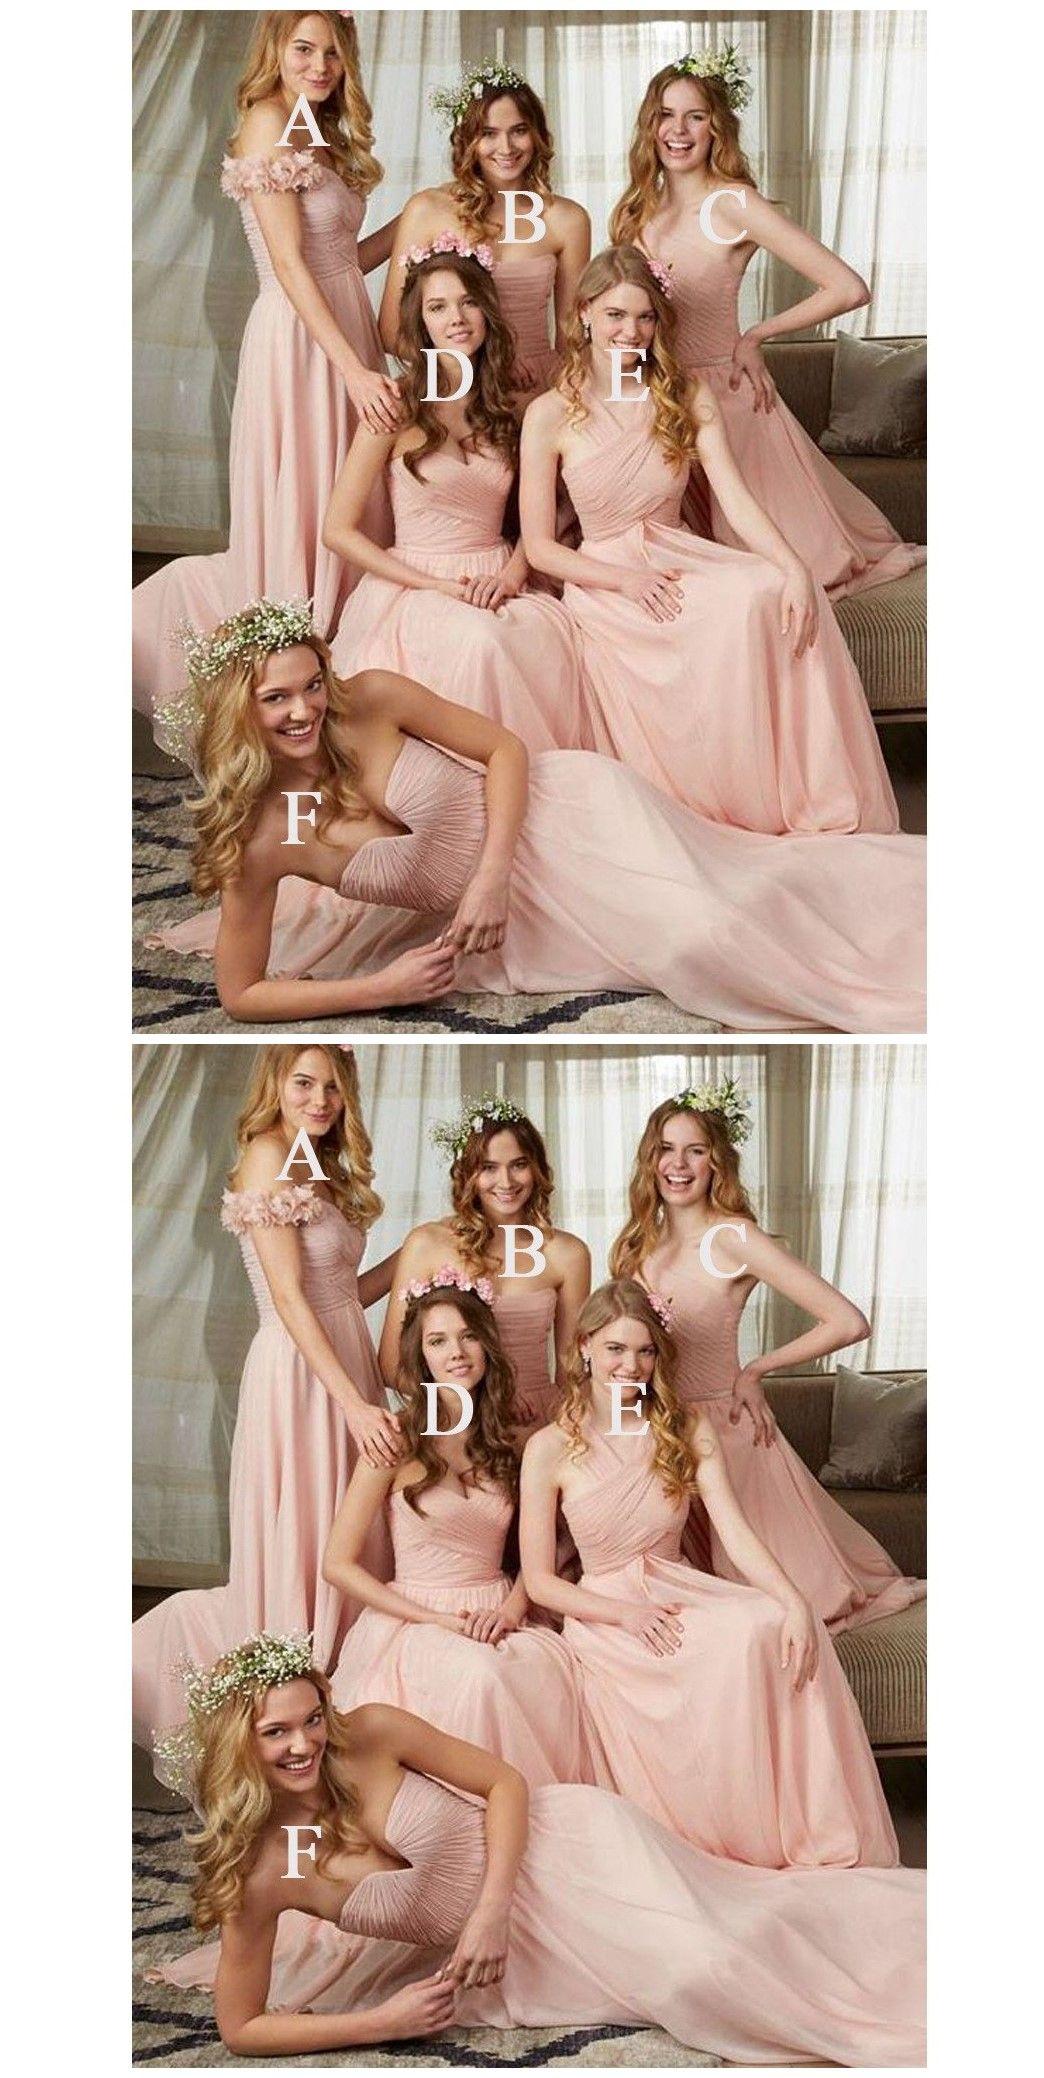 Young girls wedding dresses  Young Girls Mismatched Chiffon Pretty Cheap Long Bridesmaid Dresses